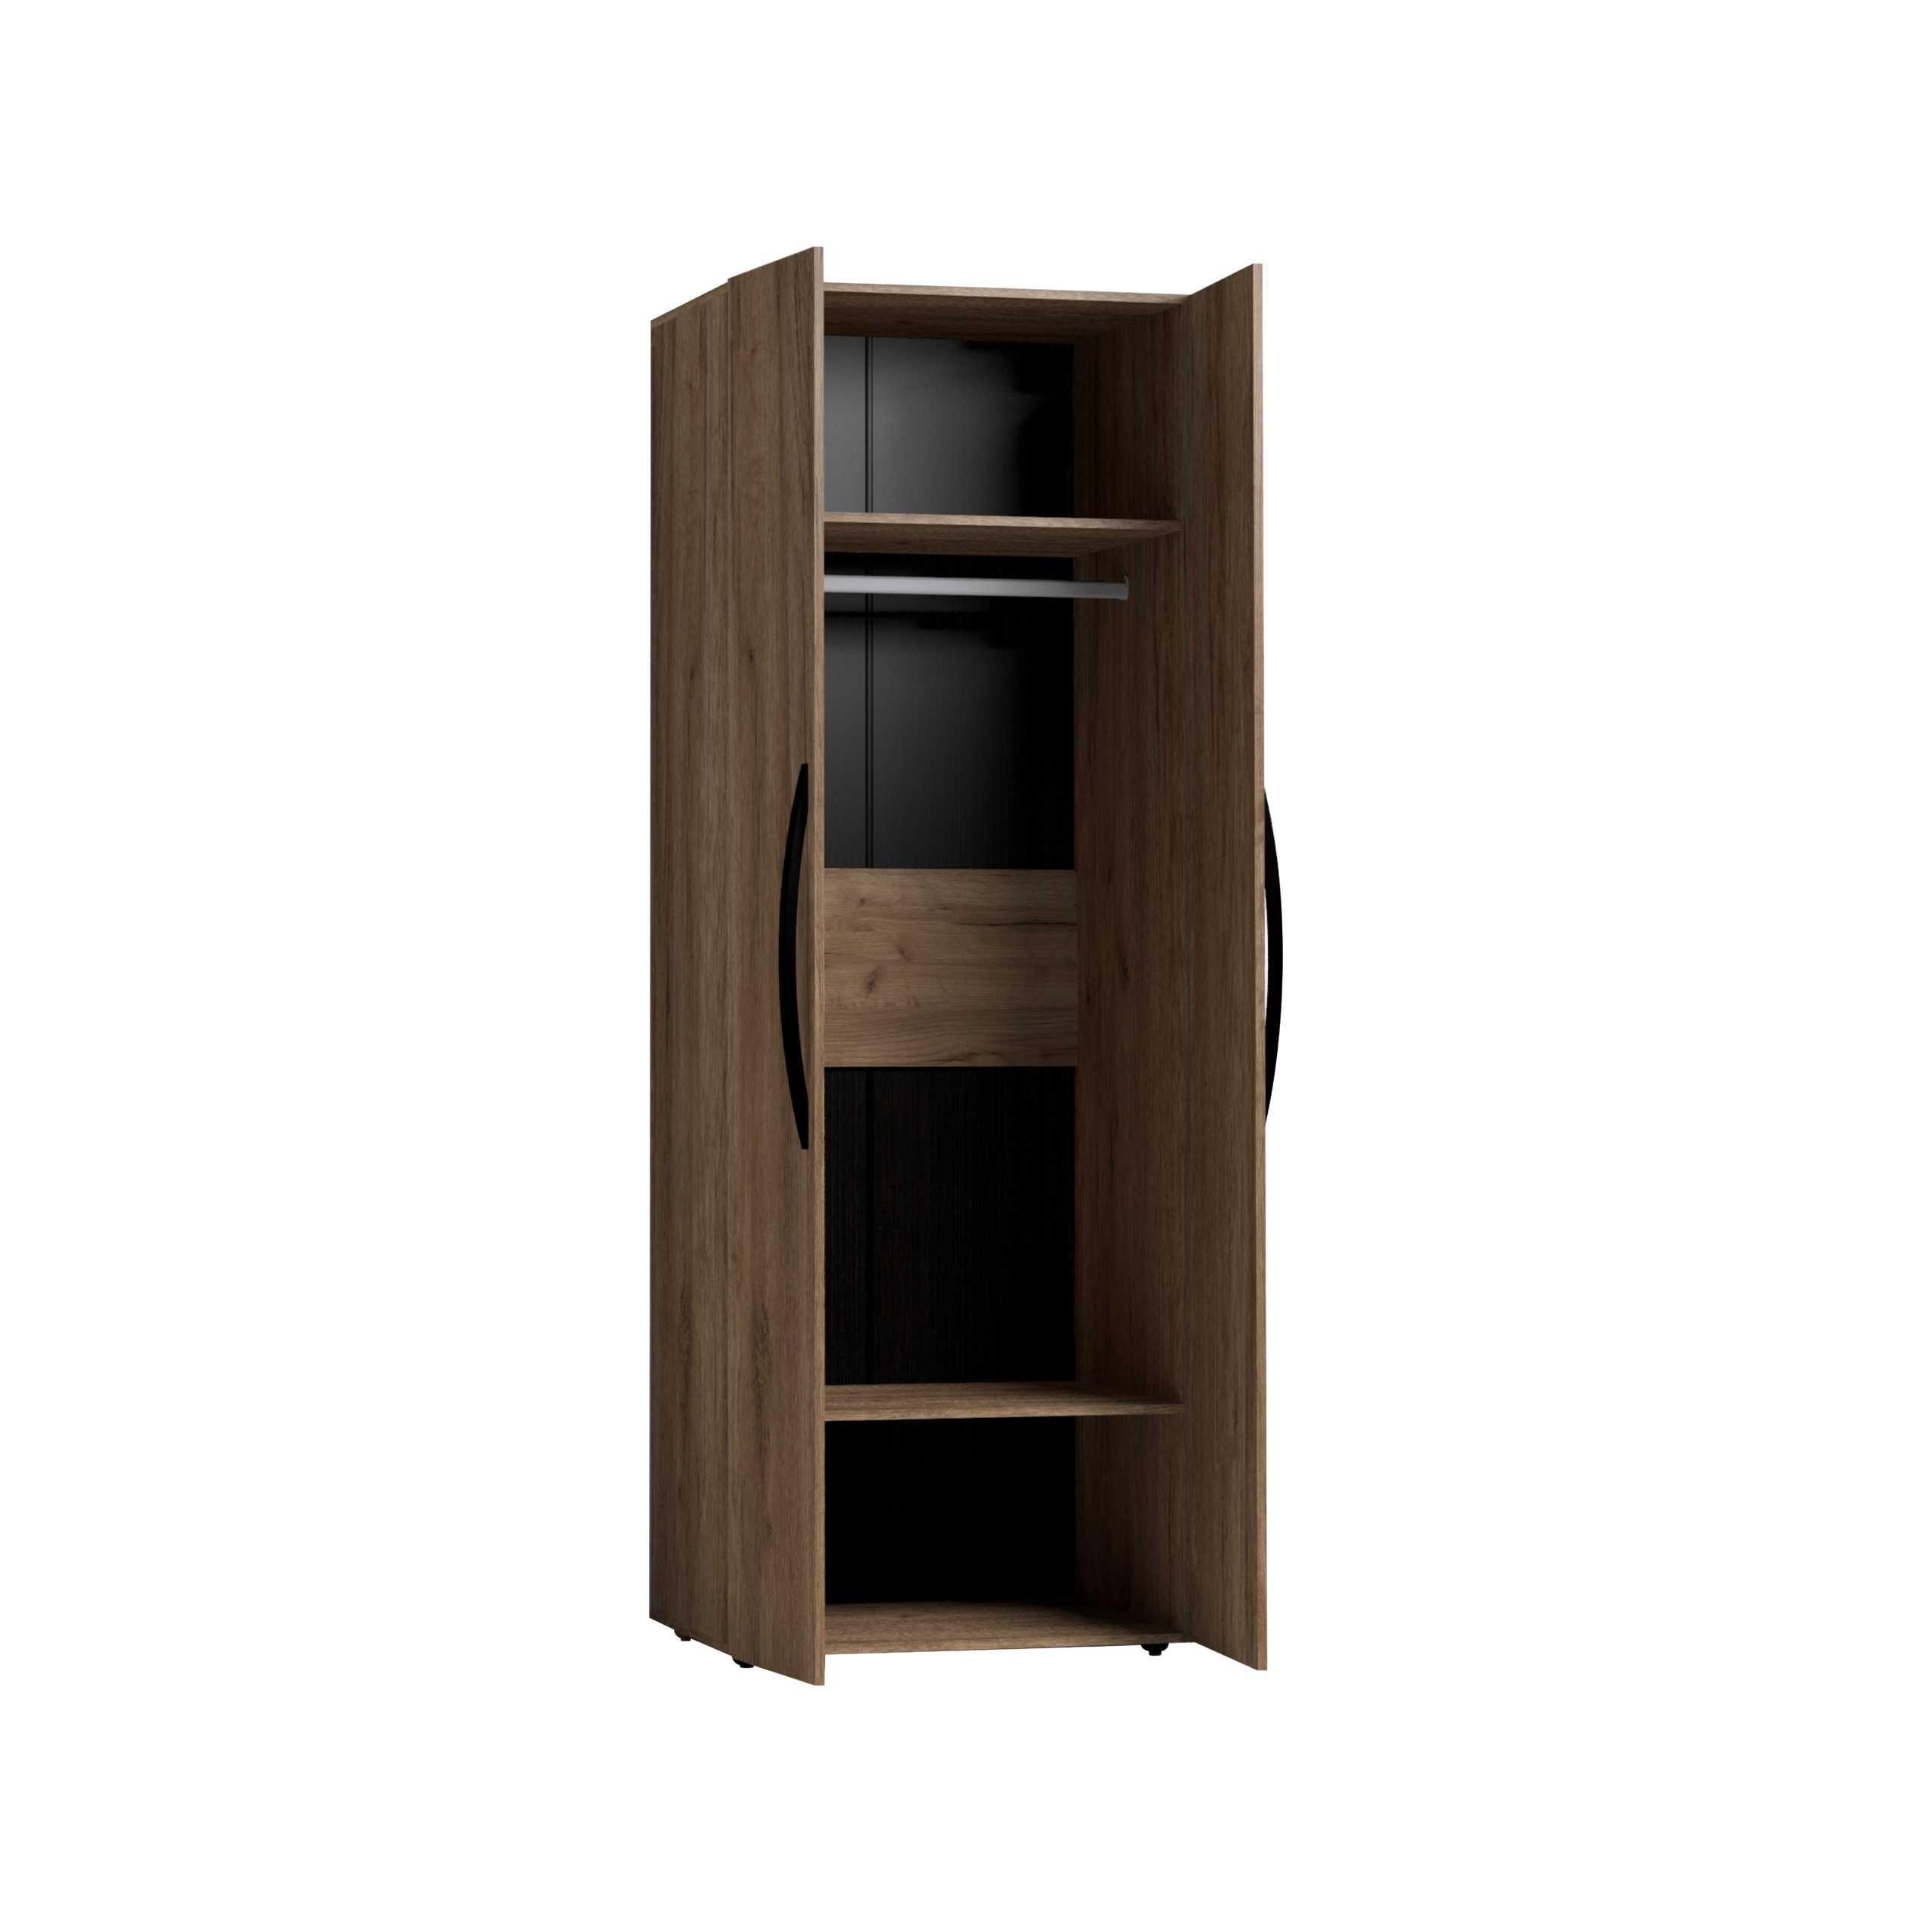 13 27 scaled - Nature 54 Шкаф для одежды с зеркалом